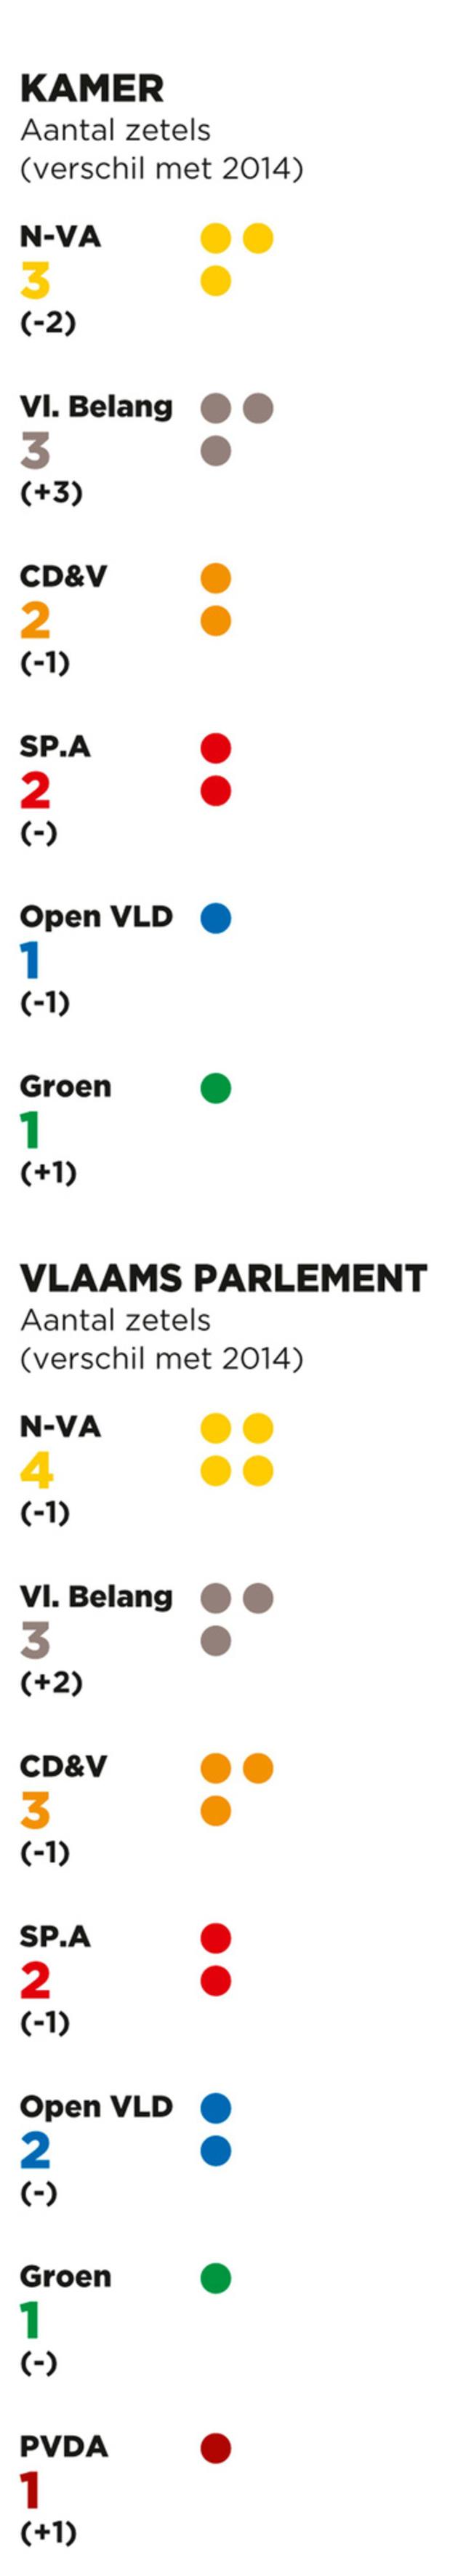 Limburg: scores federaal en Vlaams